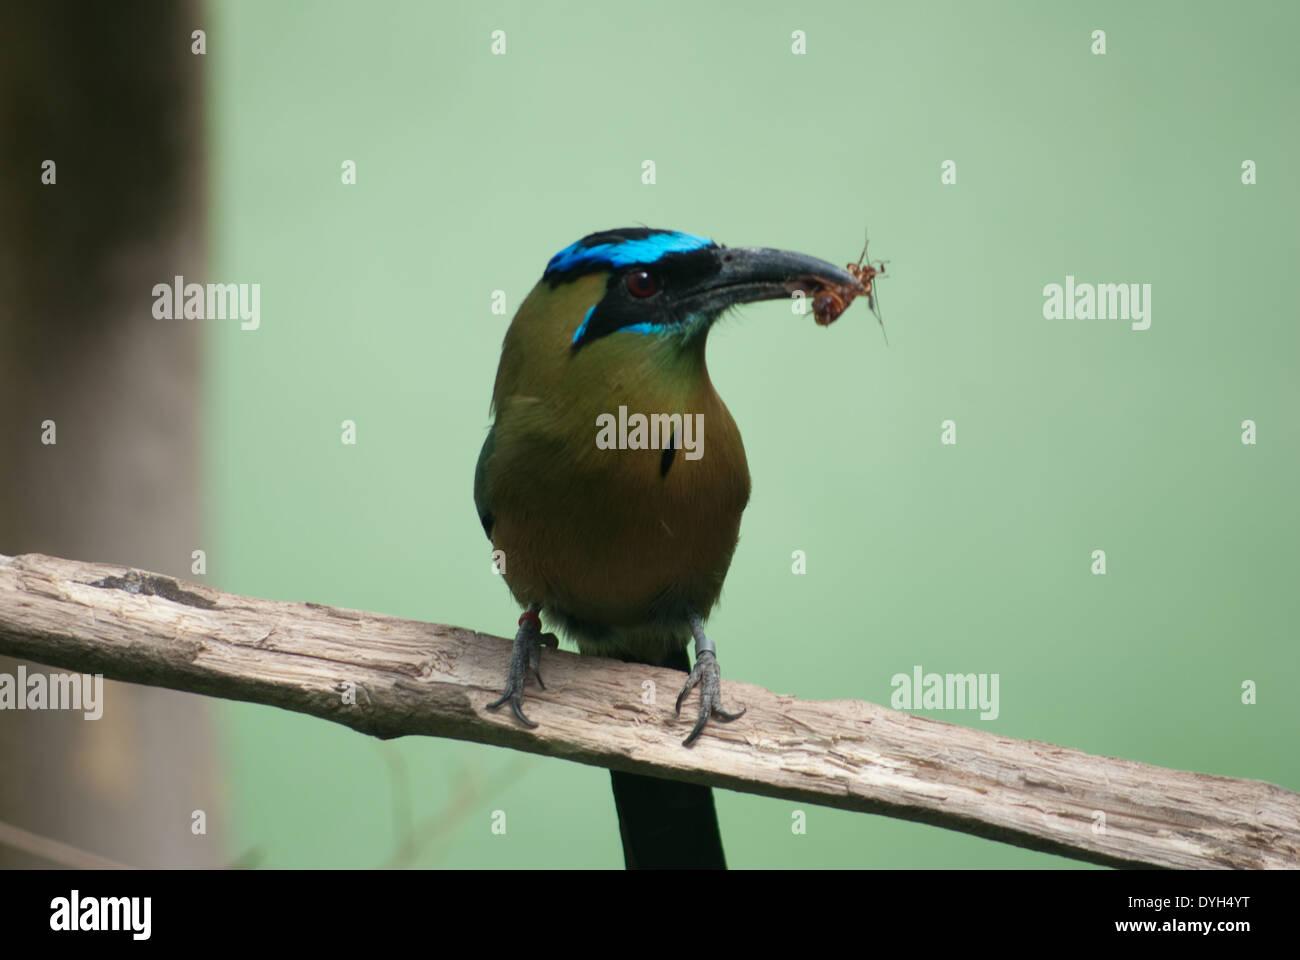 Vogel - Stock Image